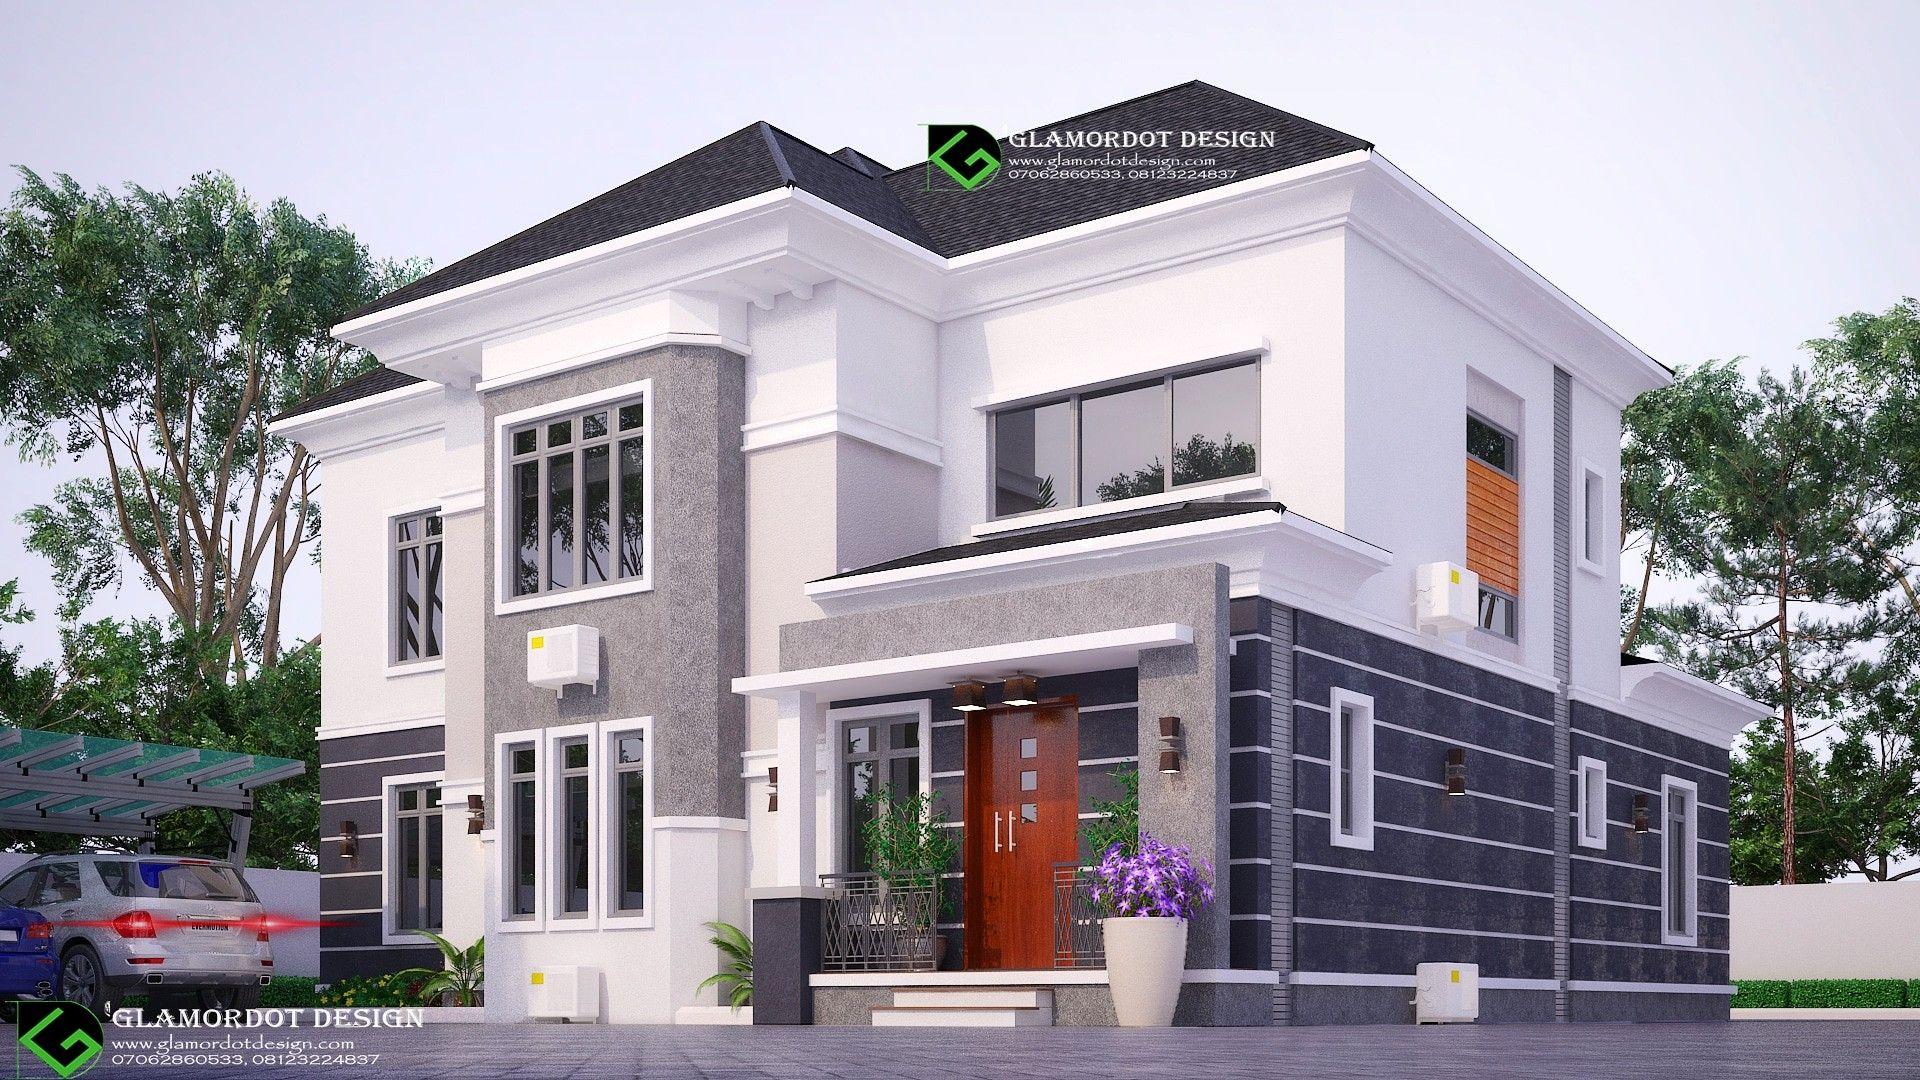 ce8704cb017215251216ebf081614d67 - 22+ Modern Style Dream House Modern Duplex House Designs In Nigeria Pictures